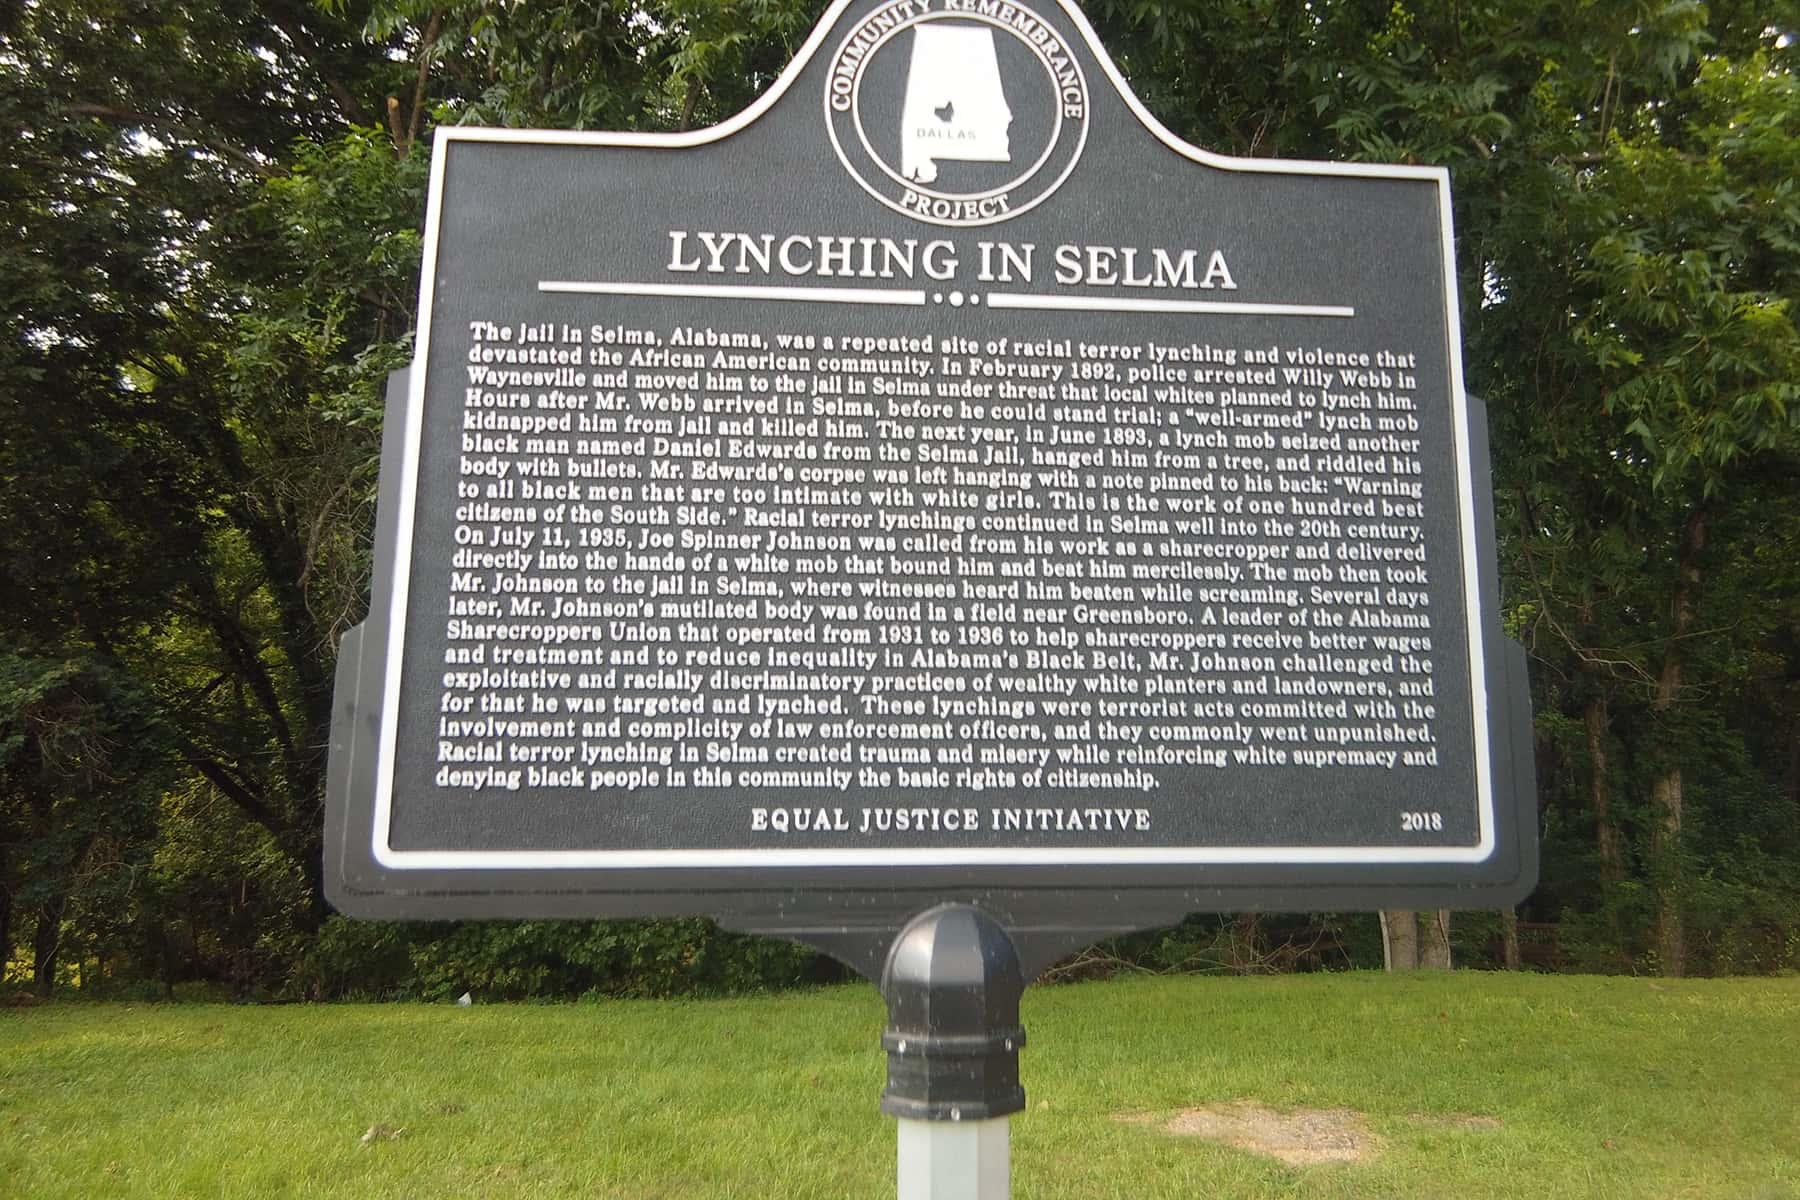 080421_Alabama_41_SelmaLynching